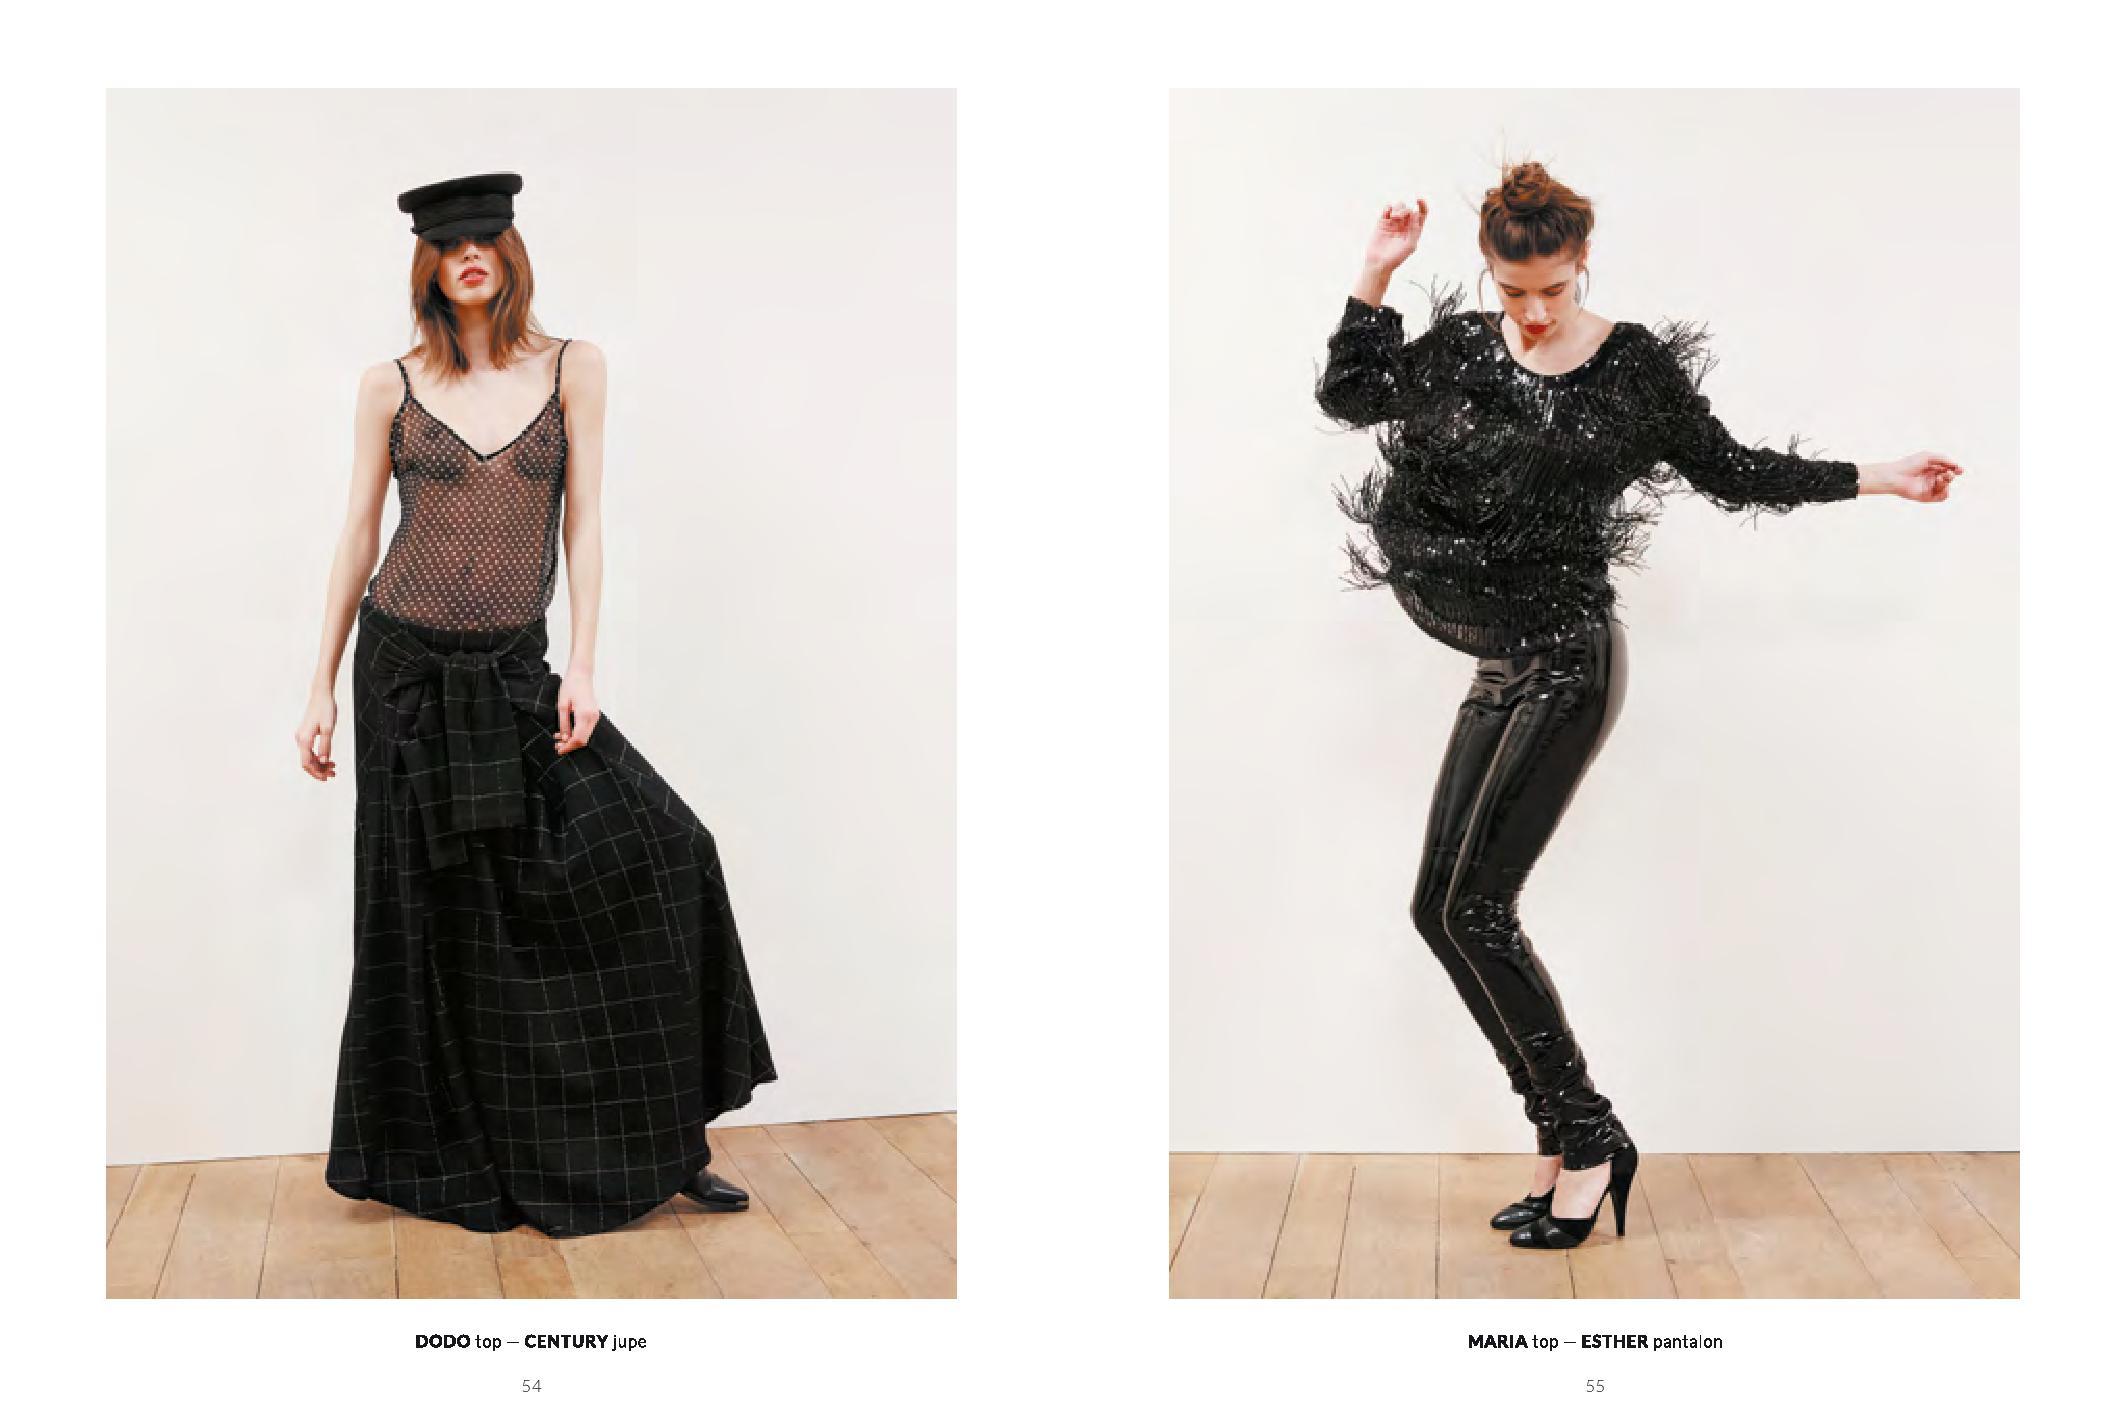 bc_md_lookbook_mes_demoiselles_paris_web_dresscode-page-030.jpg